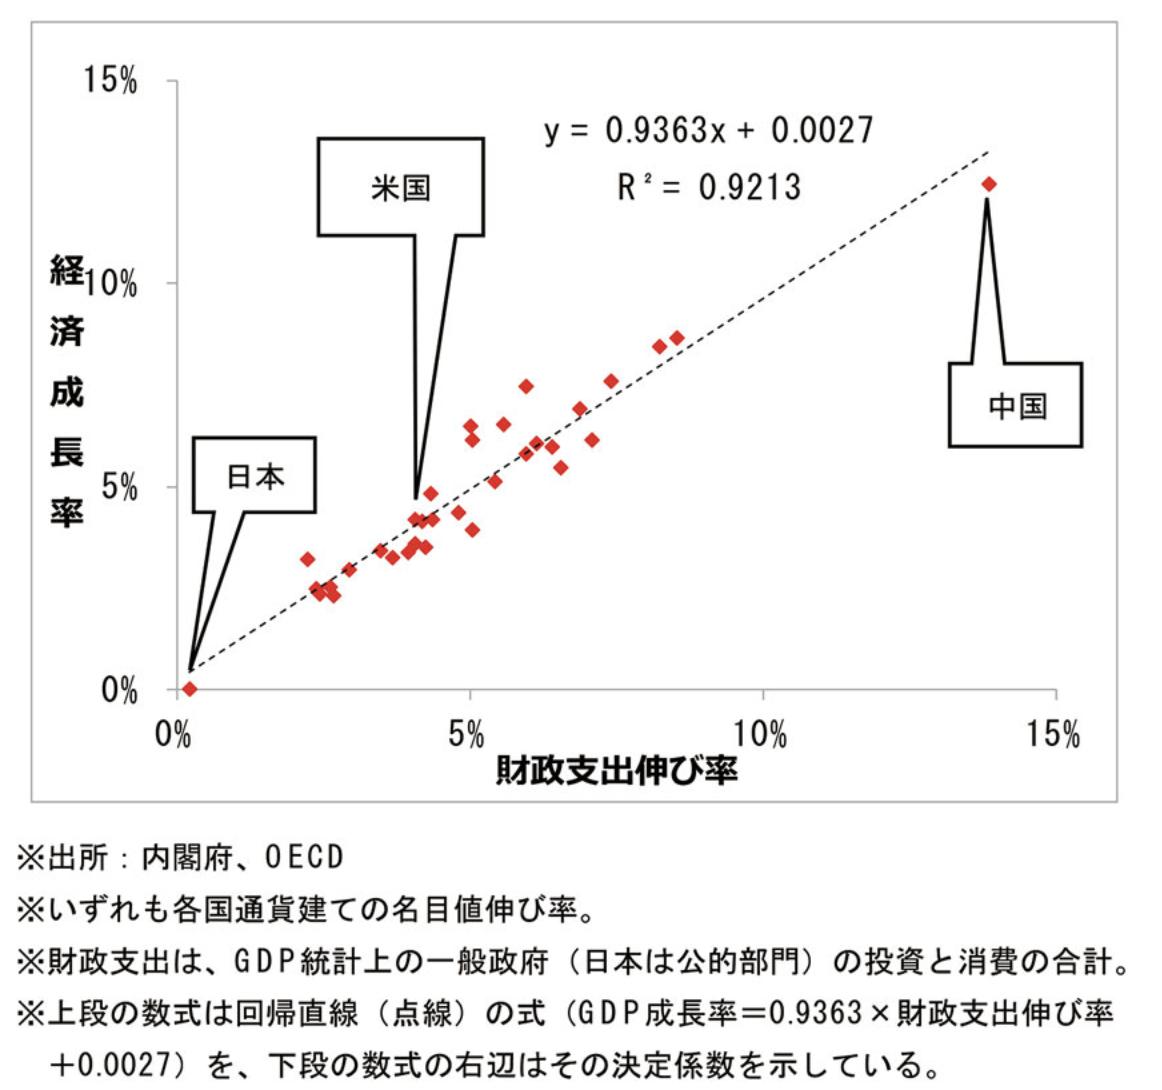 財政支出成長率と経済成長率の推移